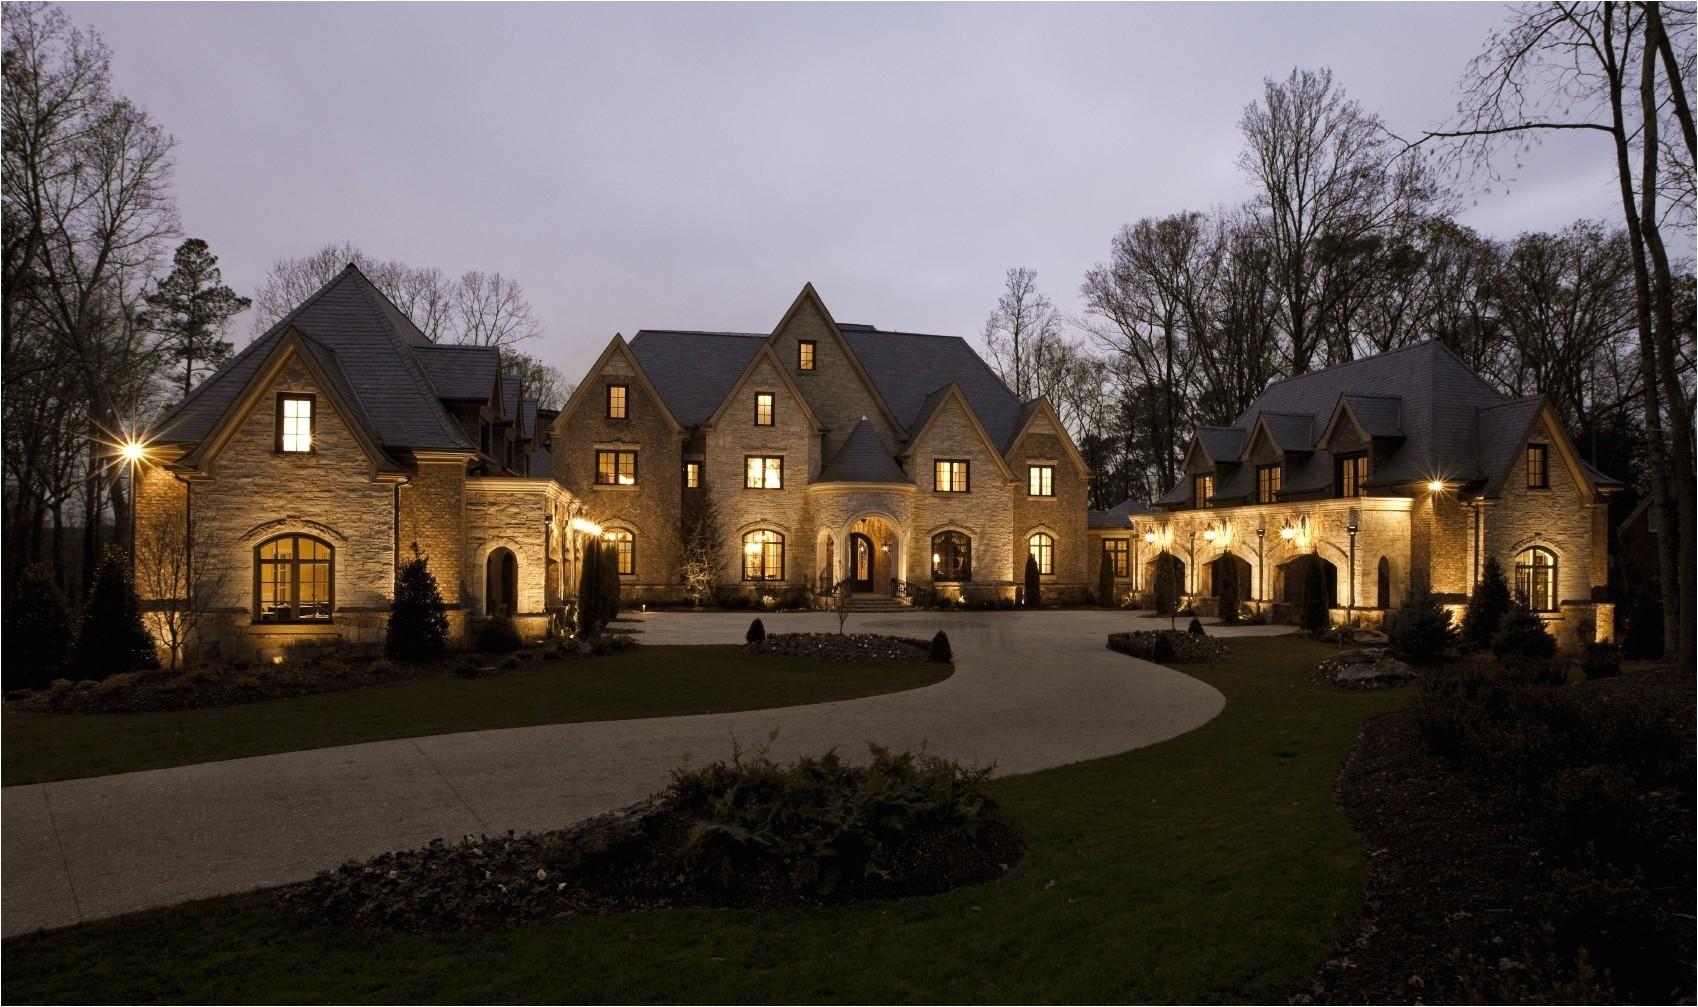 Luxury House Plans Atlanta Ga Luxury Homes For Sale In Buckhead Atlanta Ga  At Home